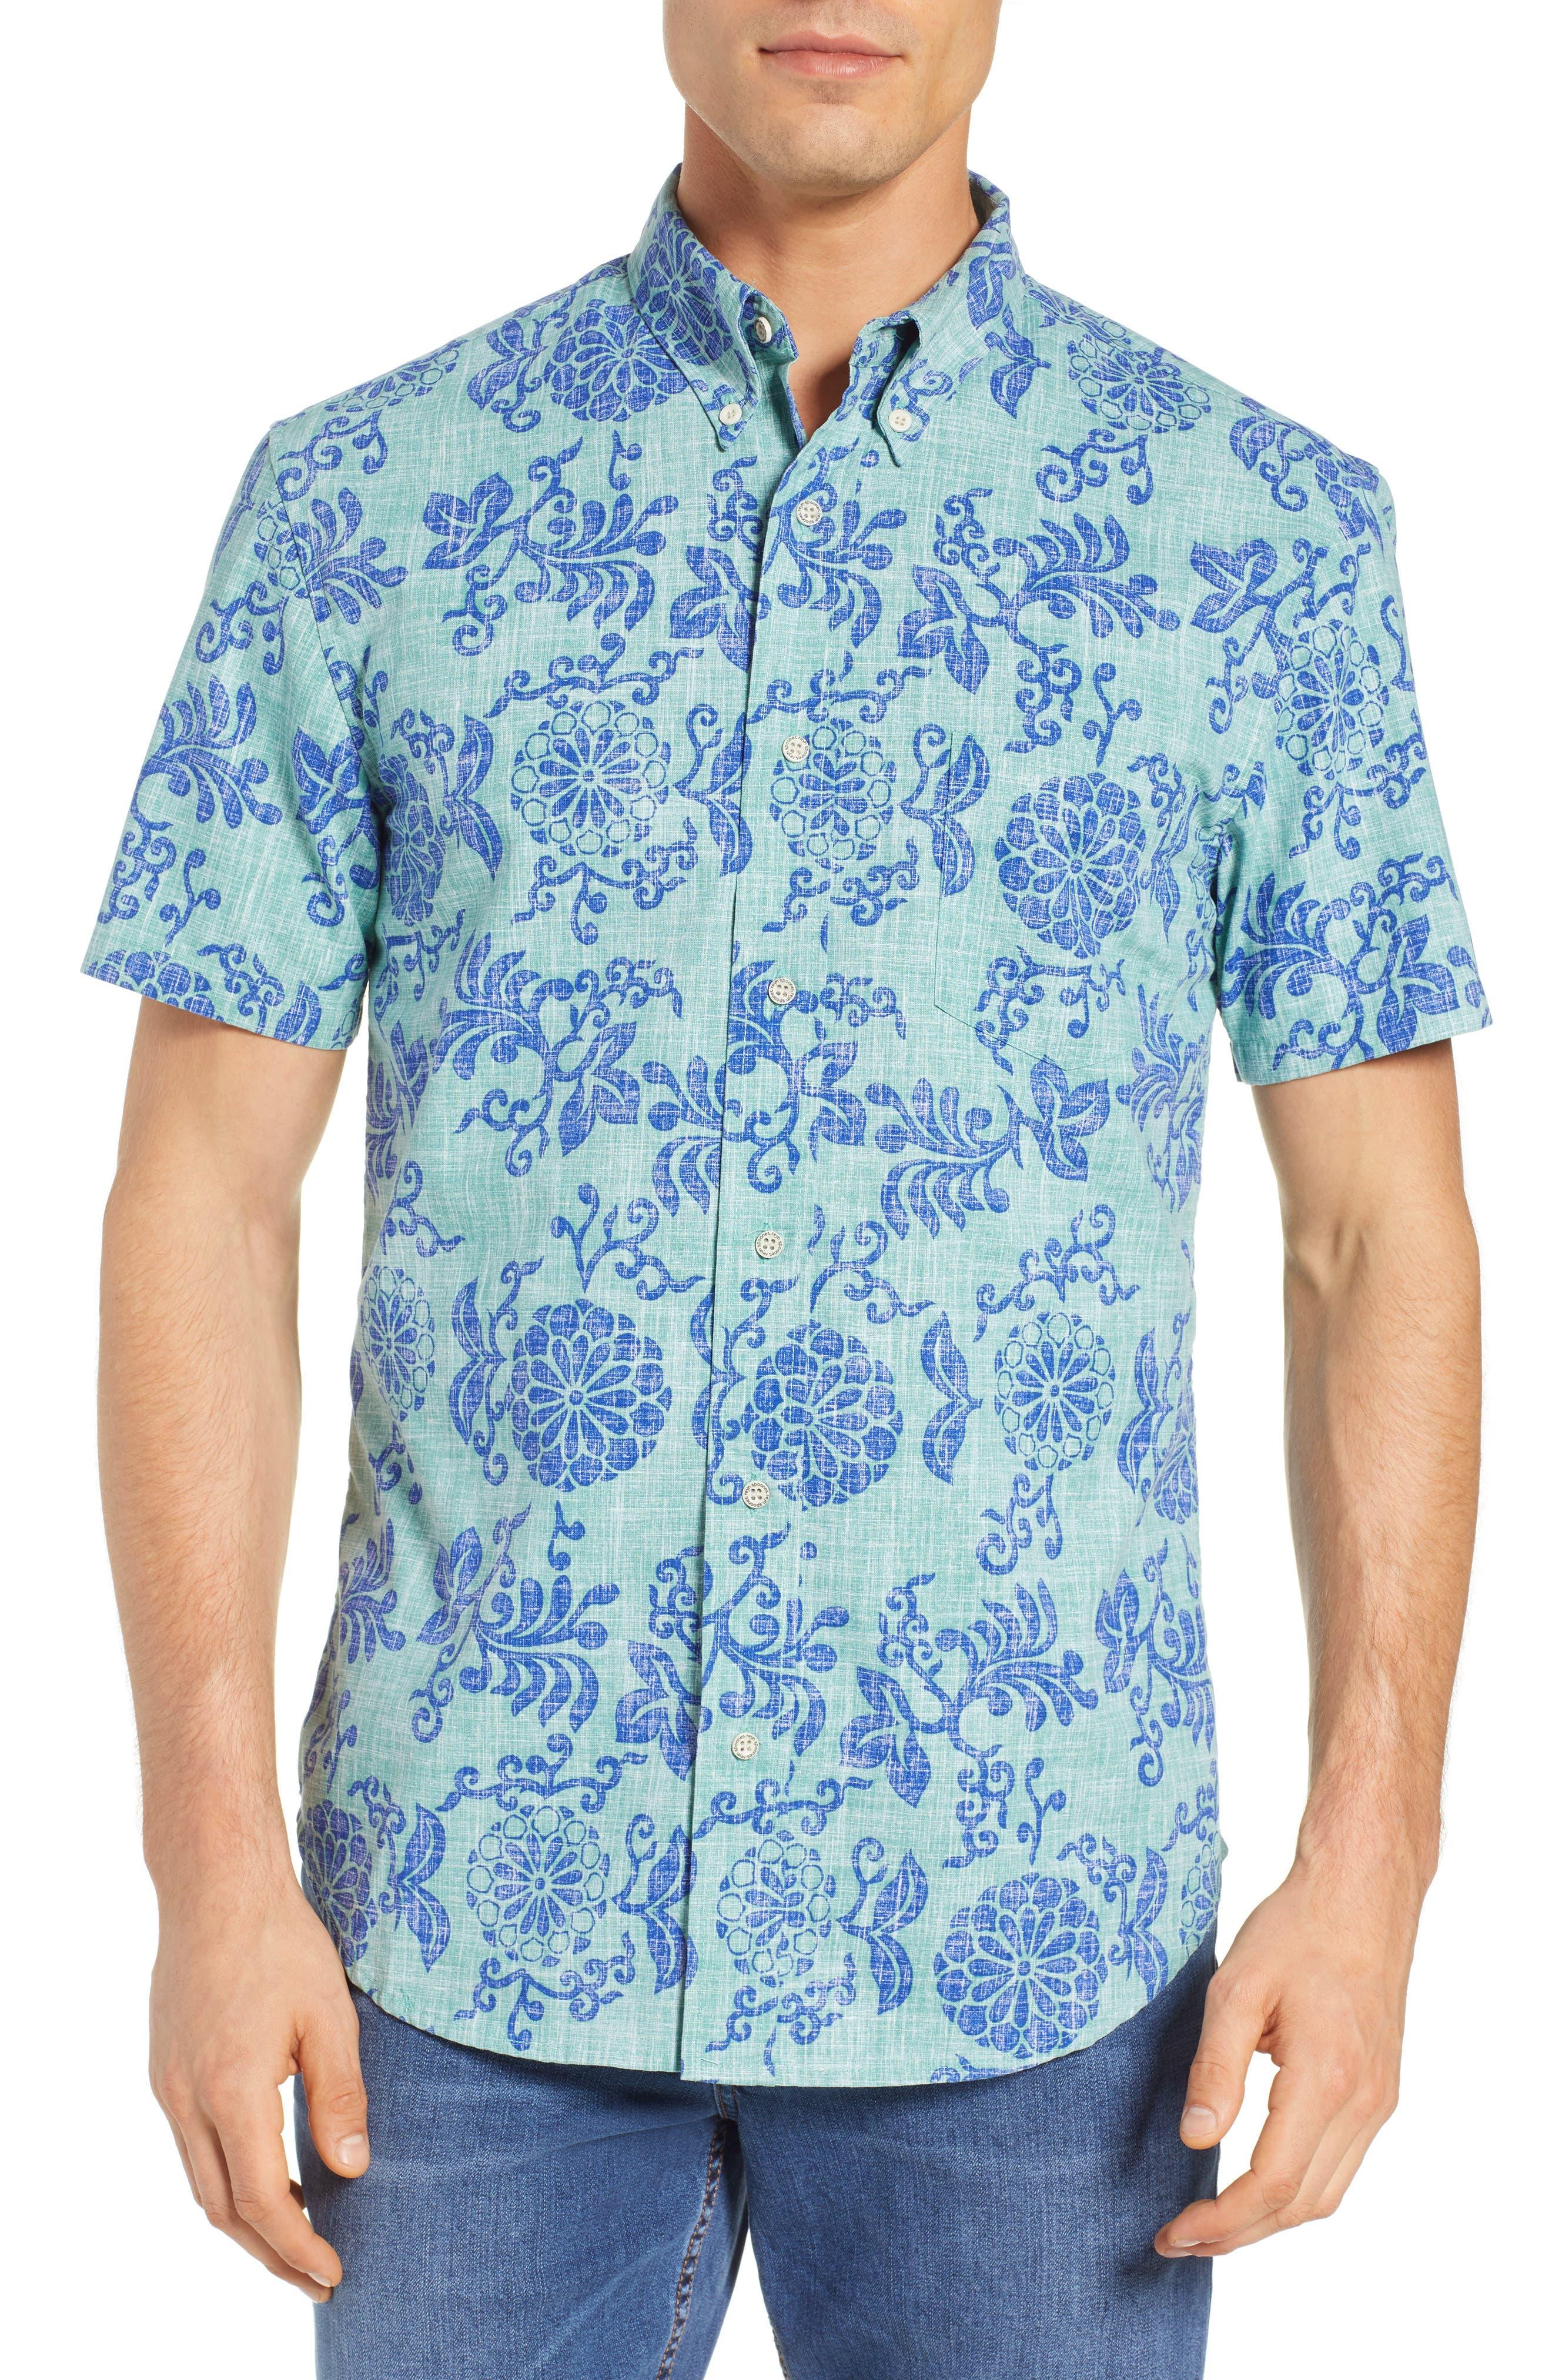 REYN SPOONER, Royal Chrysanthemums Regular Fit Sport Shirt, Main thumbnail 1, color, 310